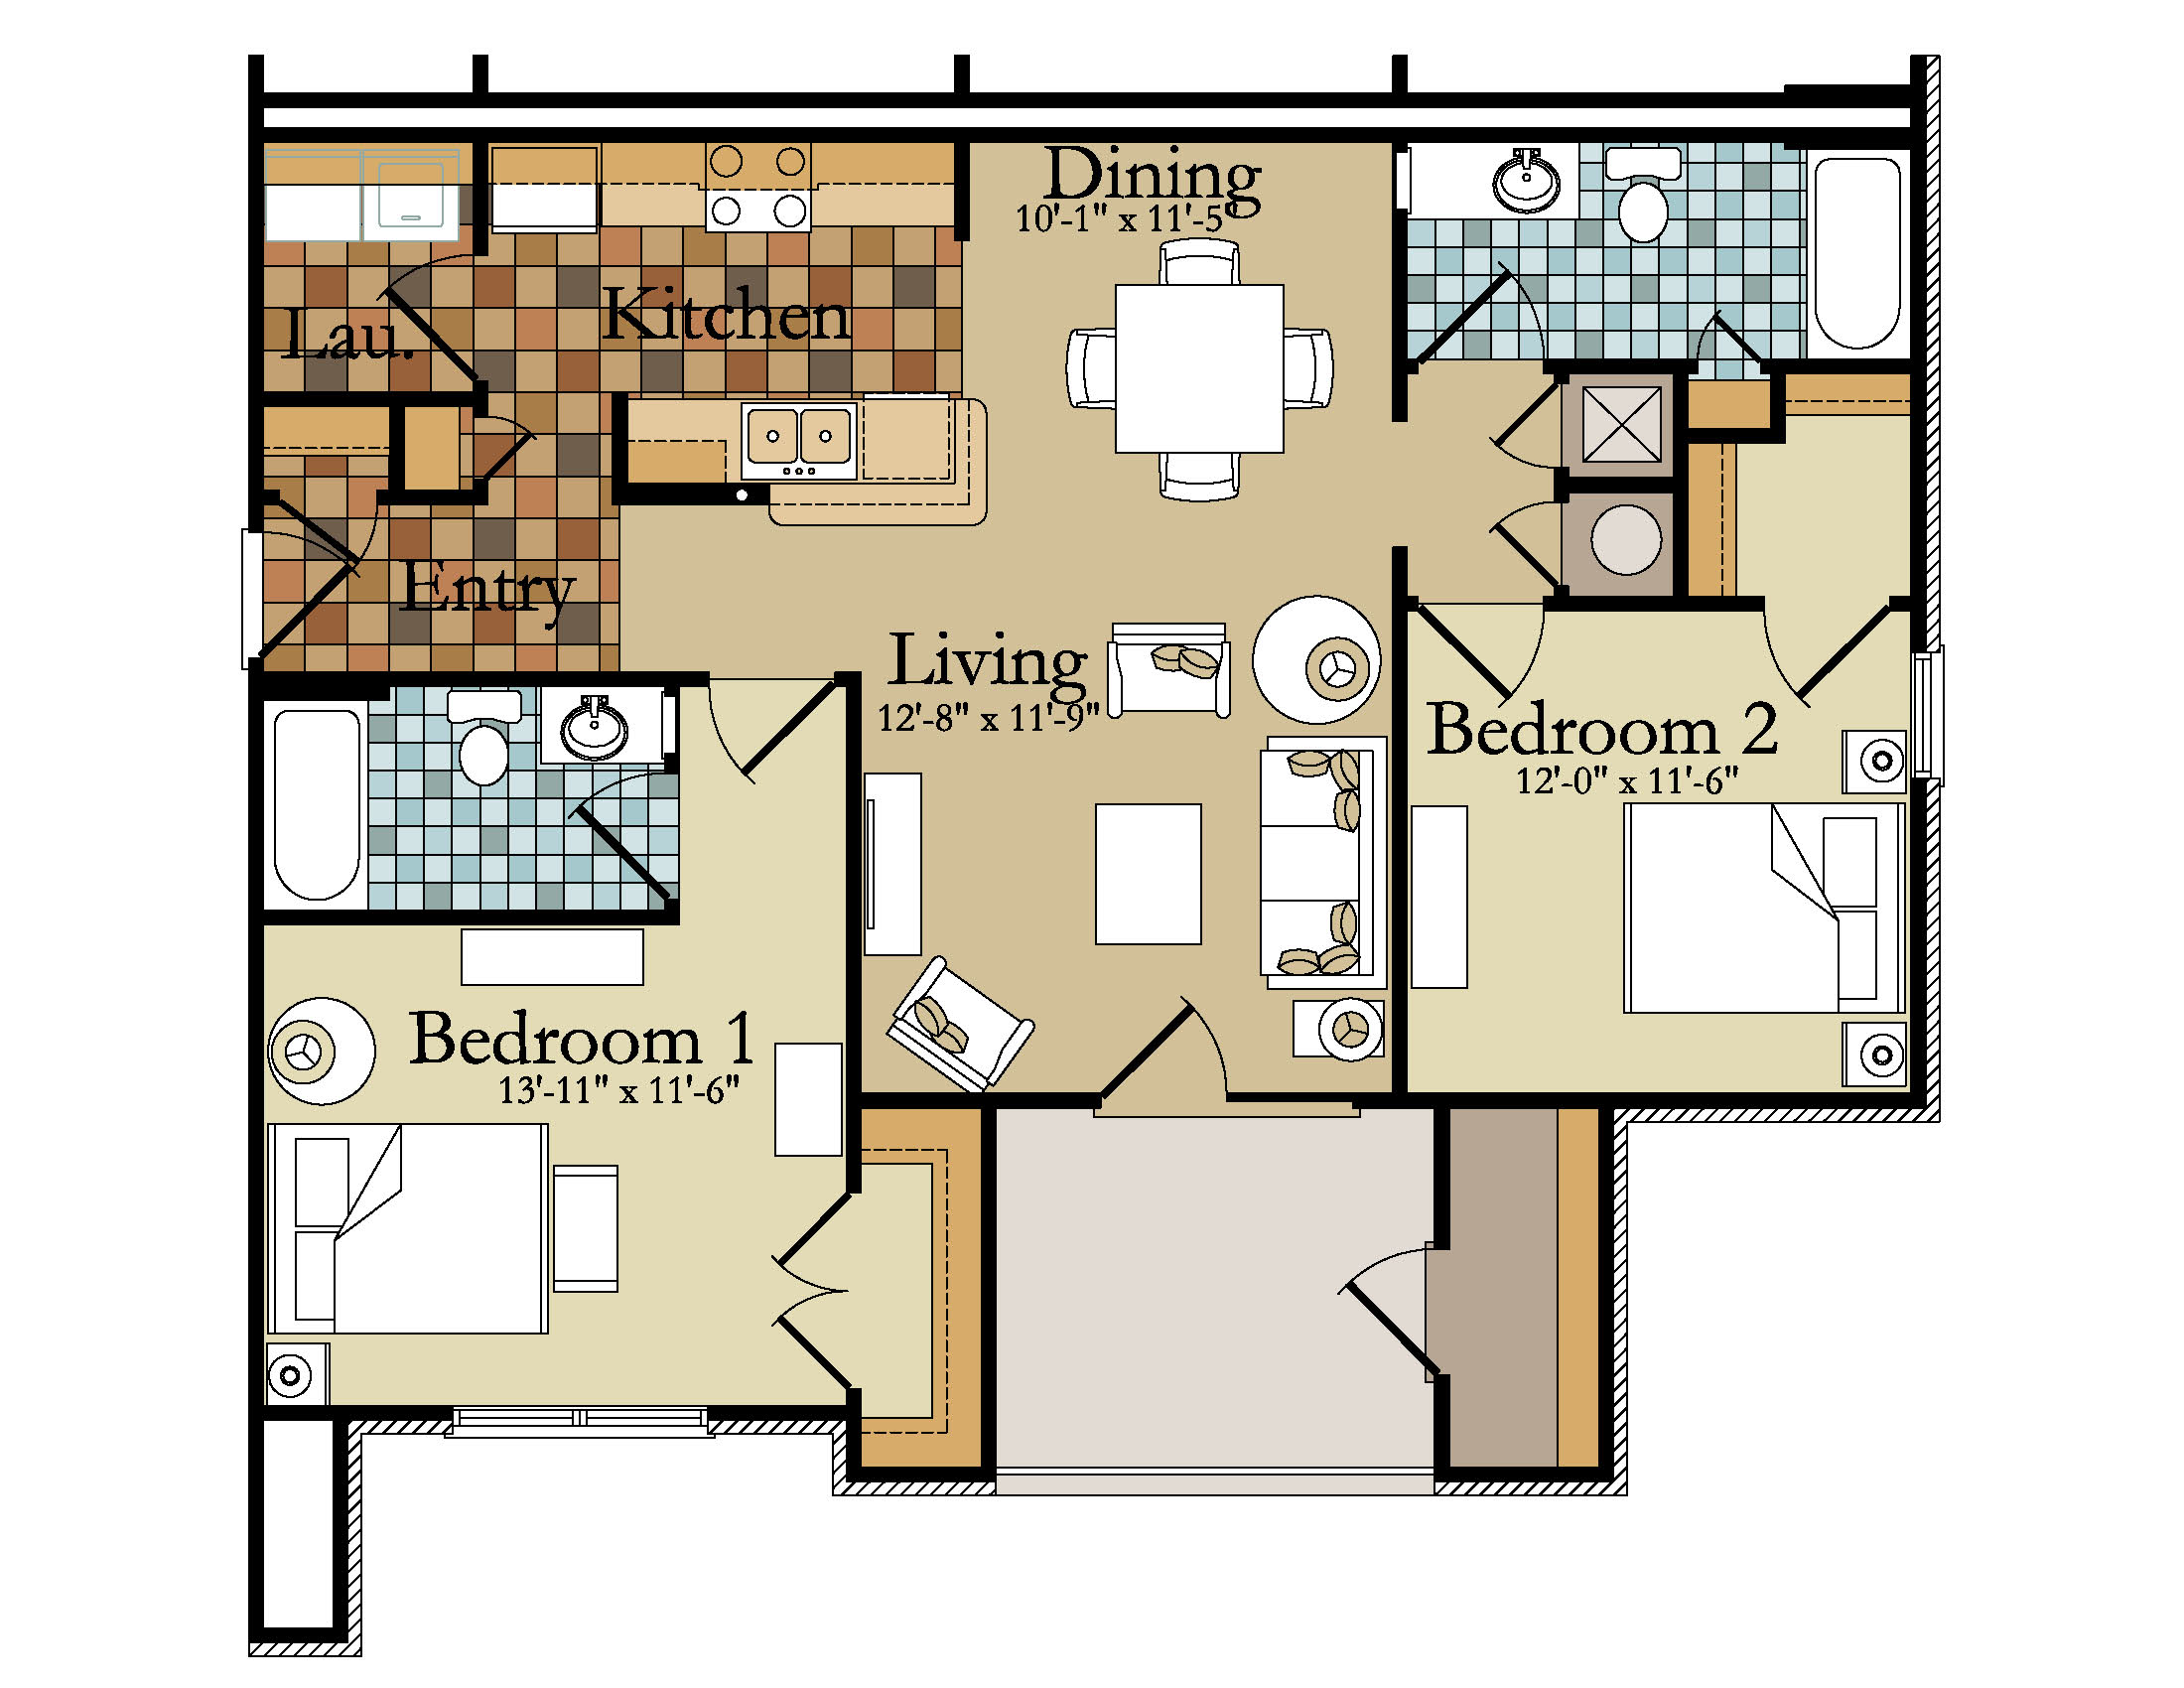 Greystone homes az floorplans home review for Greystone homes floor plans